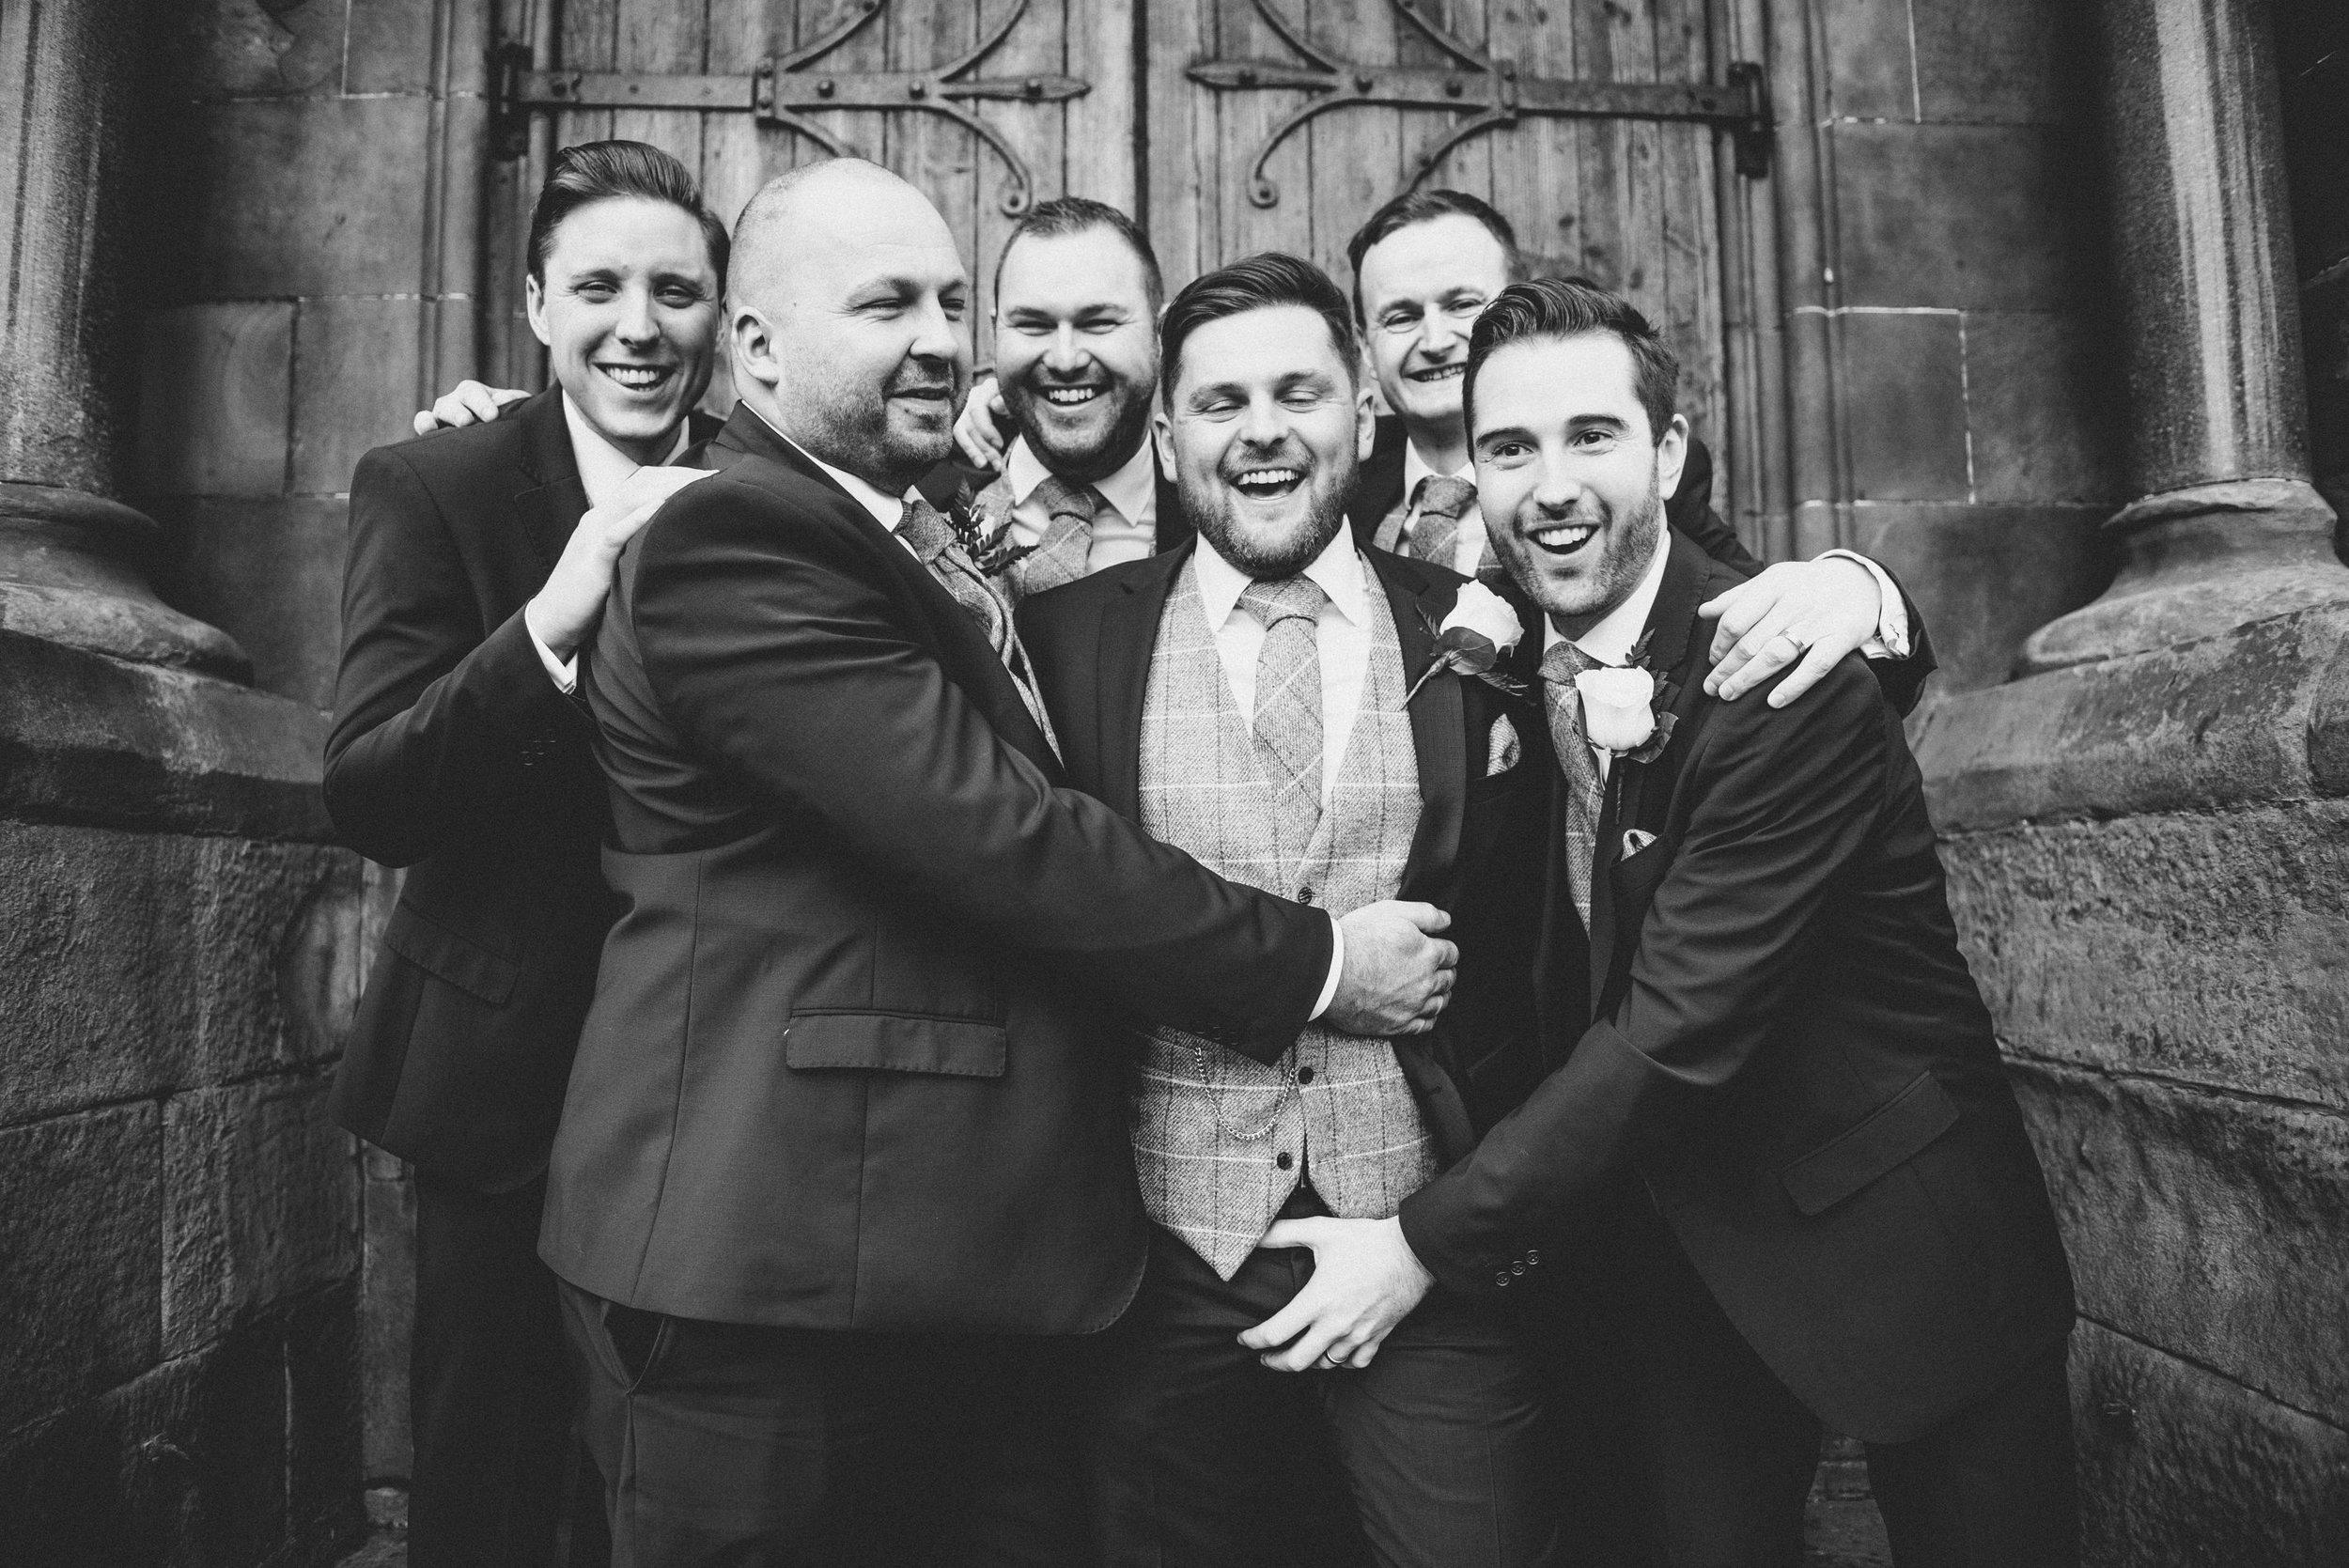 0134-LISA-DEVINE-PHOTOGRAPHY-ALTERNATIVE-WEDDING-PHOTOGRAPHY-SCOTLAND-DESTINATION-WEDDINGS-GLASGOW-WEDDINGS-COOL-WEDDINGS-STYLISH-WEDDINGS.JPG